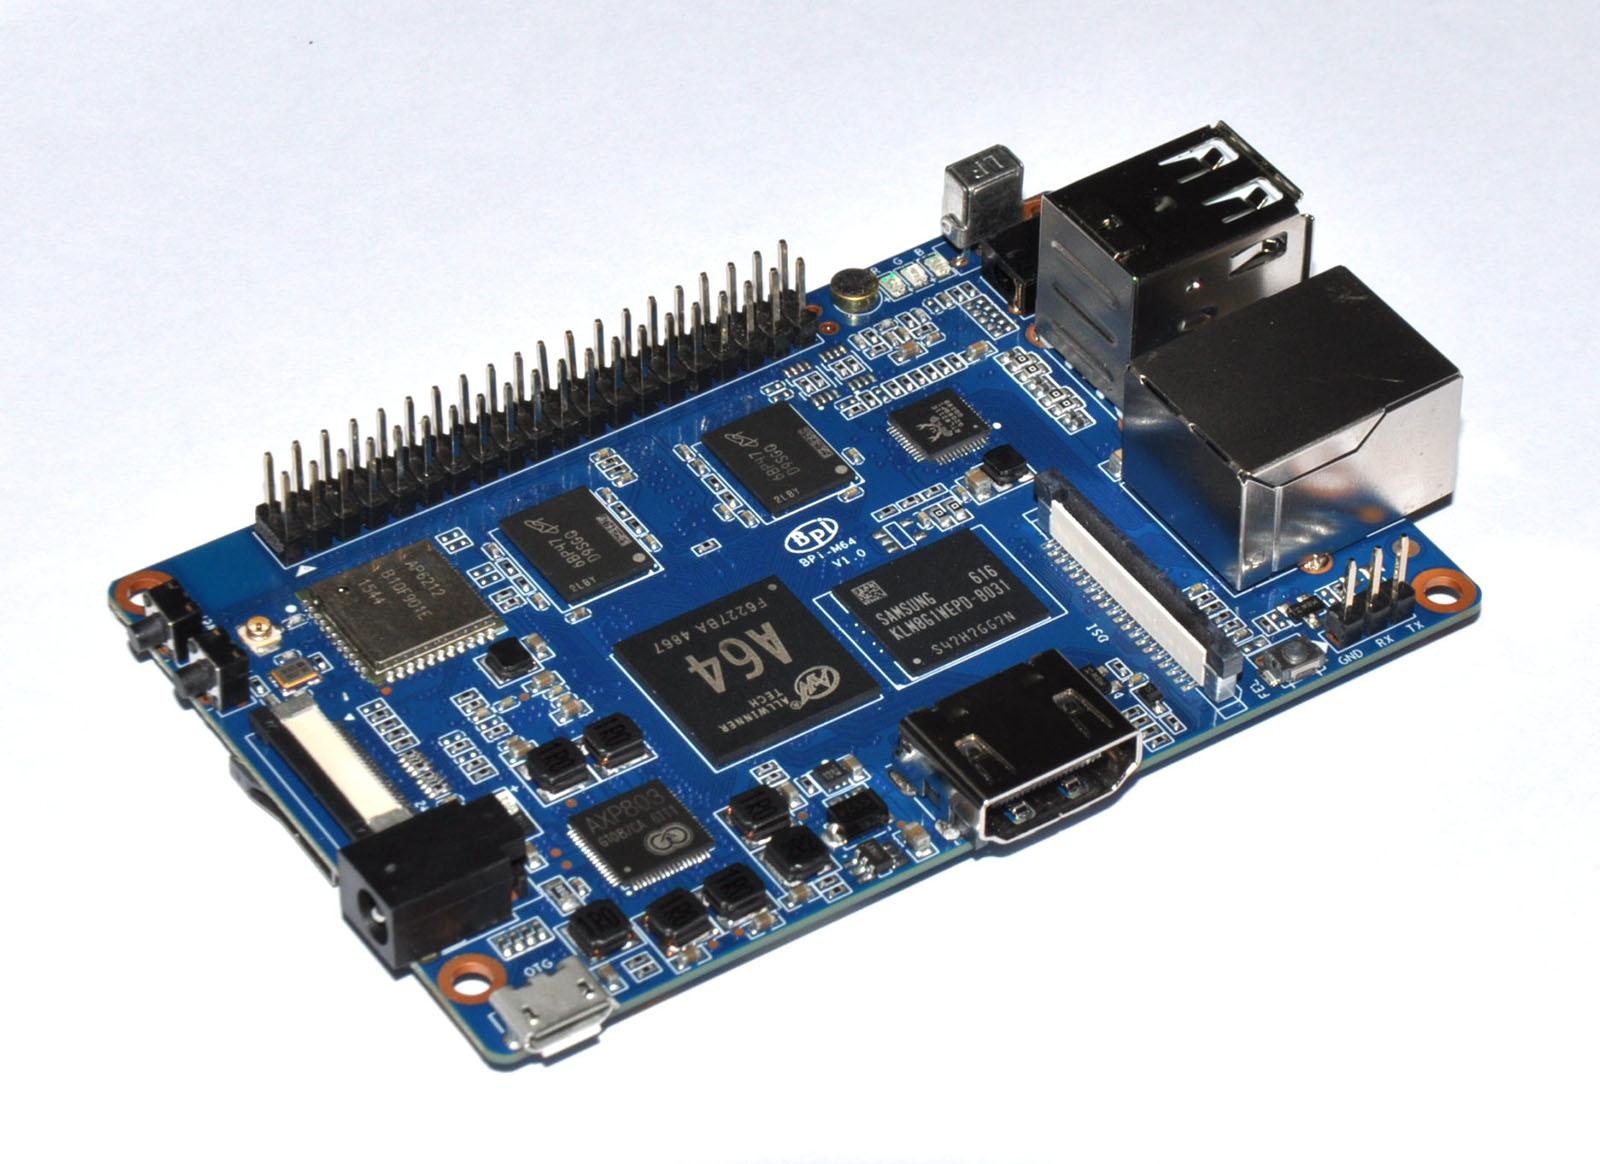 64-bit quad-core mini single board computer BPI-M64 Banana Pi M64